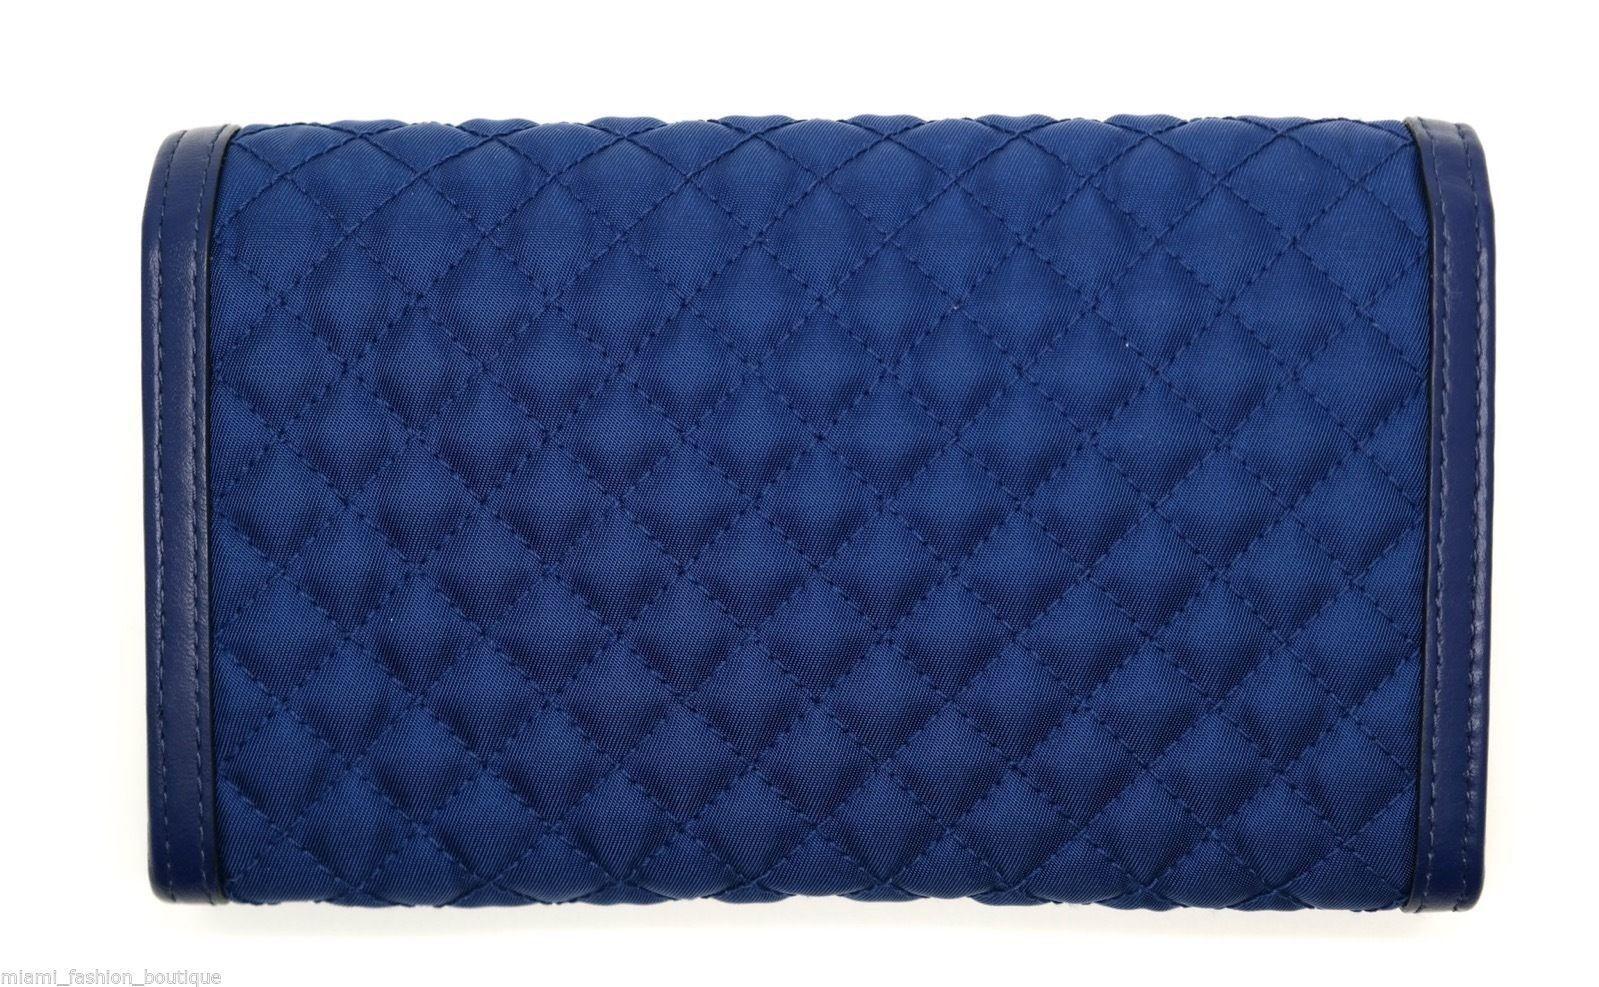 edf7d0ac5d9b Prada Cross Body Bag Messenger Clutch Wallet Quilted Nylon Blue New $349.0